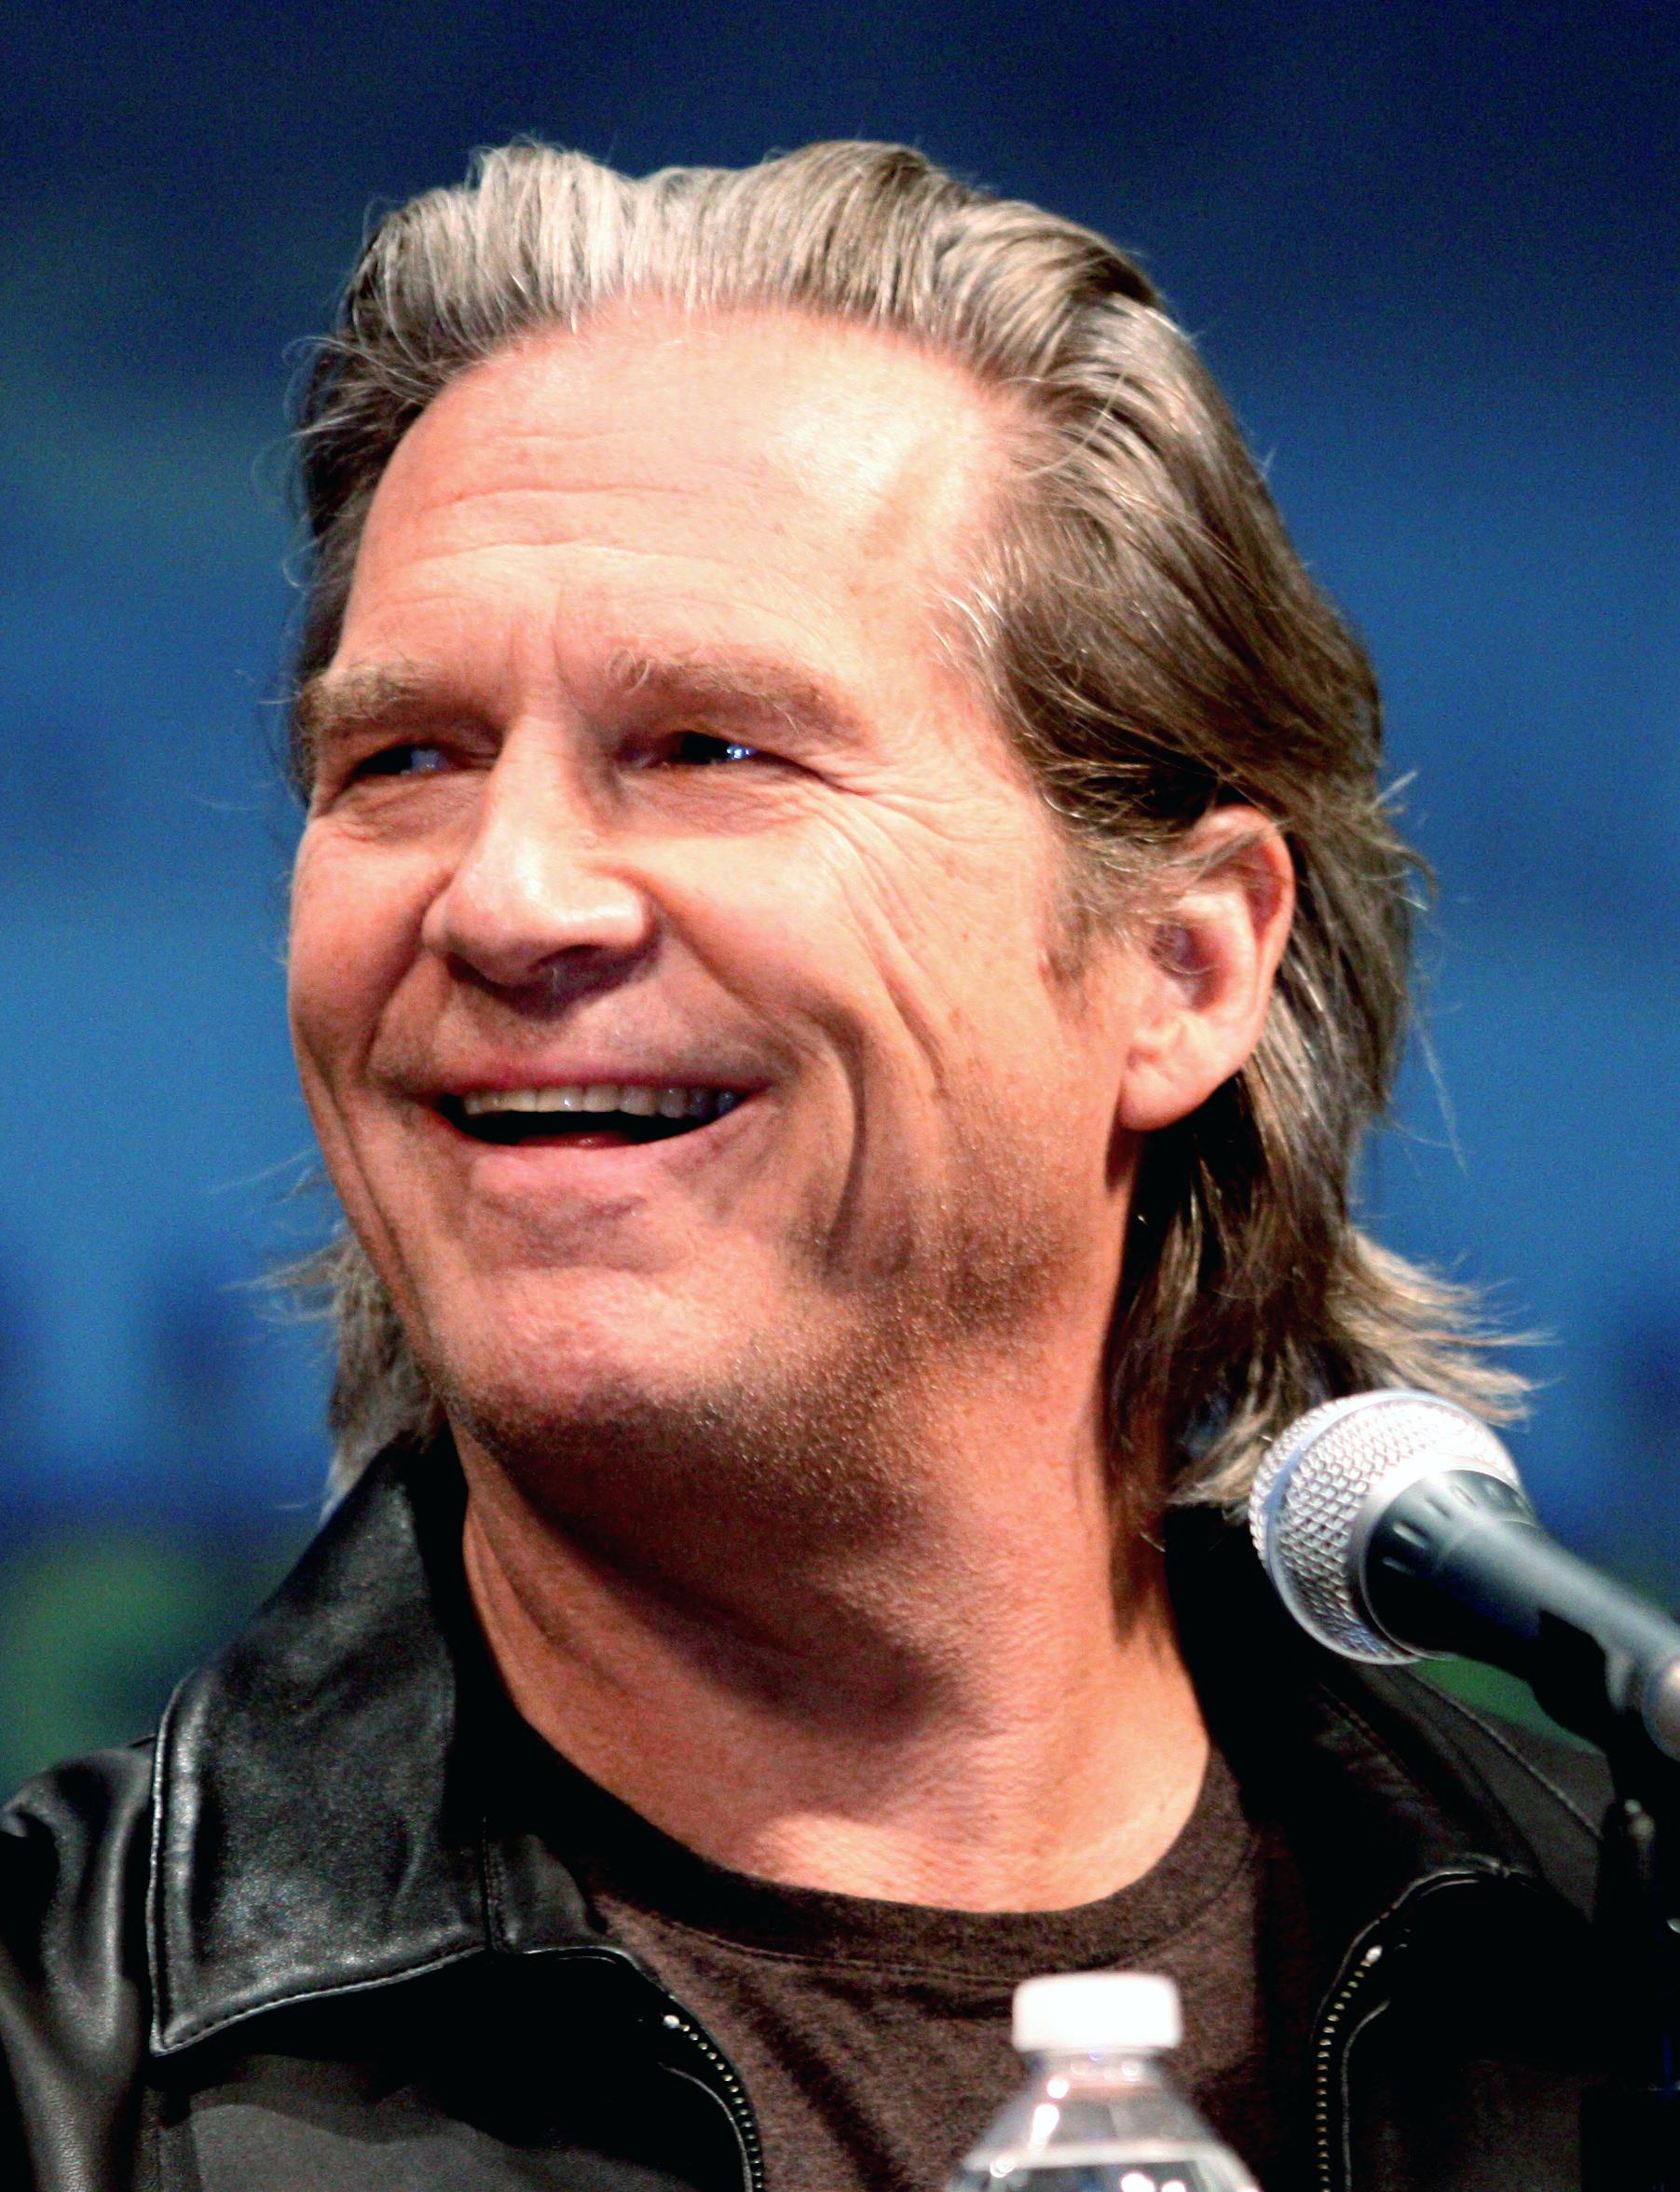 Image of Jeff Bridges from Wikidata